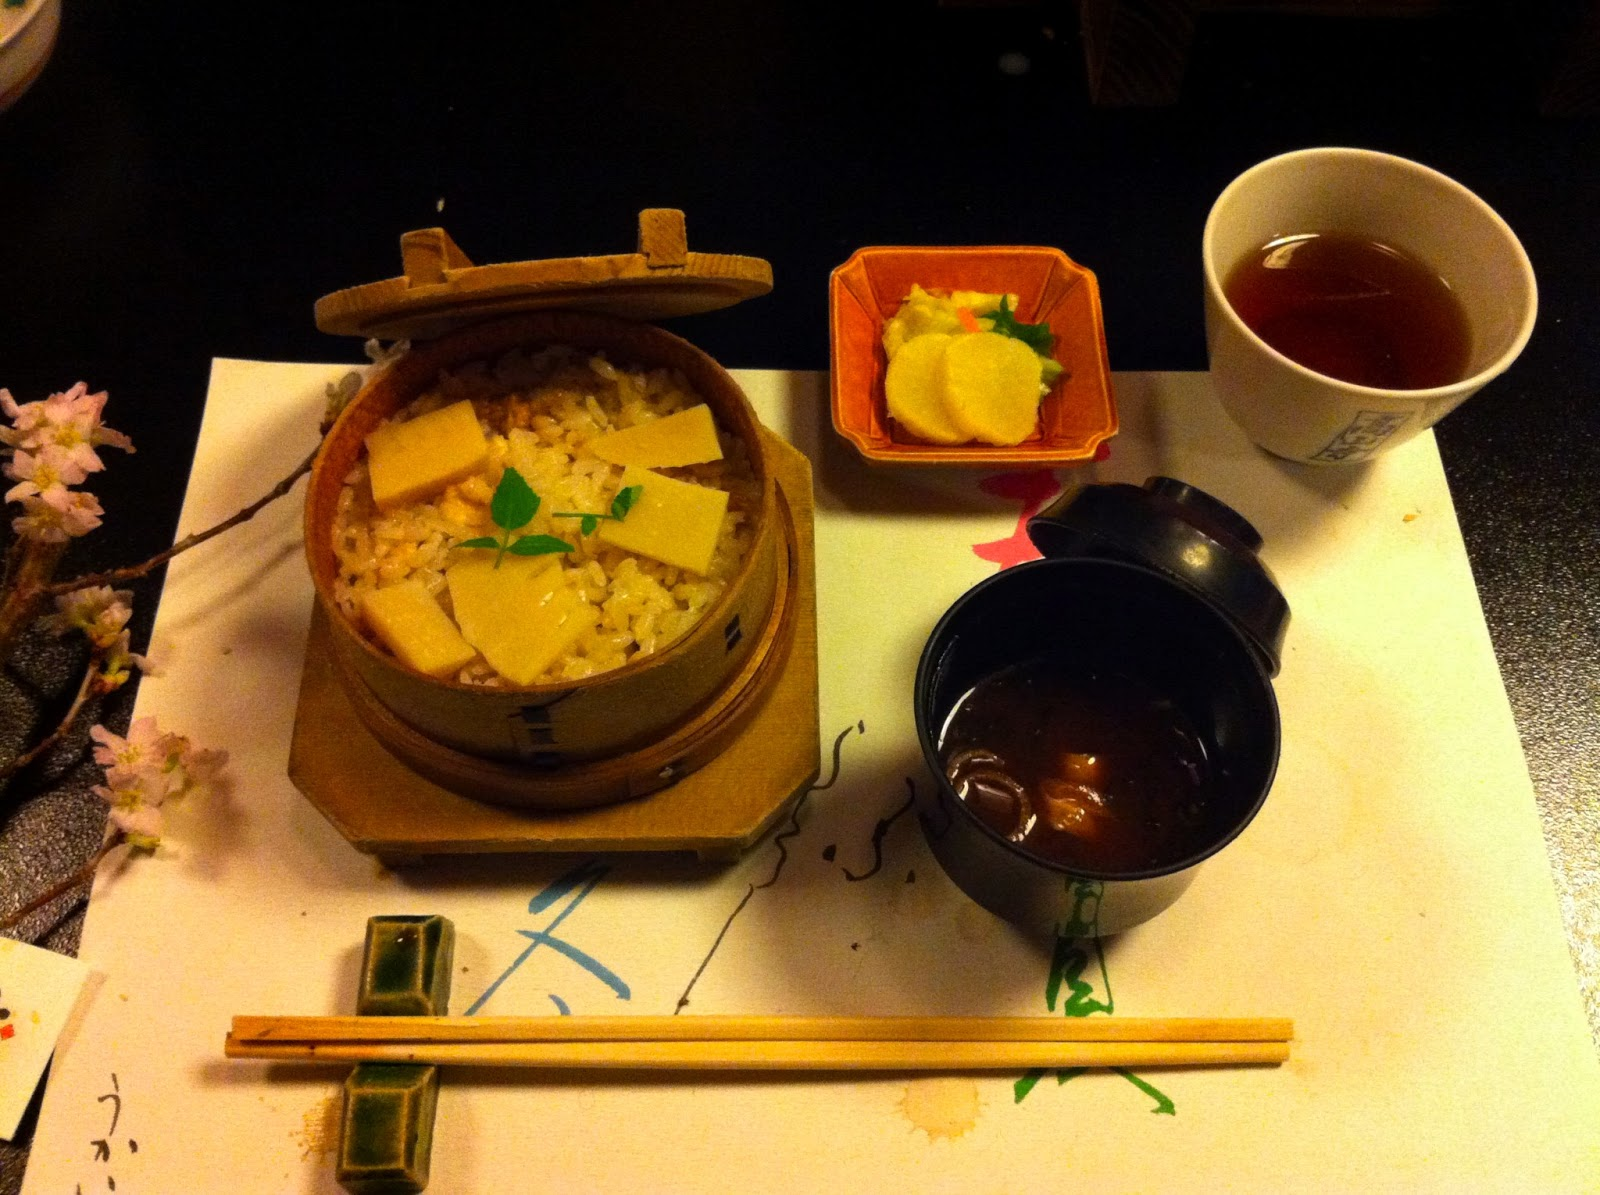 Ma vraie cuisine japonaise cuisine traditionnelle kaiseki - Cuisine japonaise traditionnelle ...